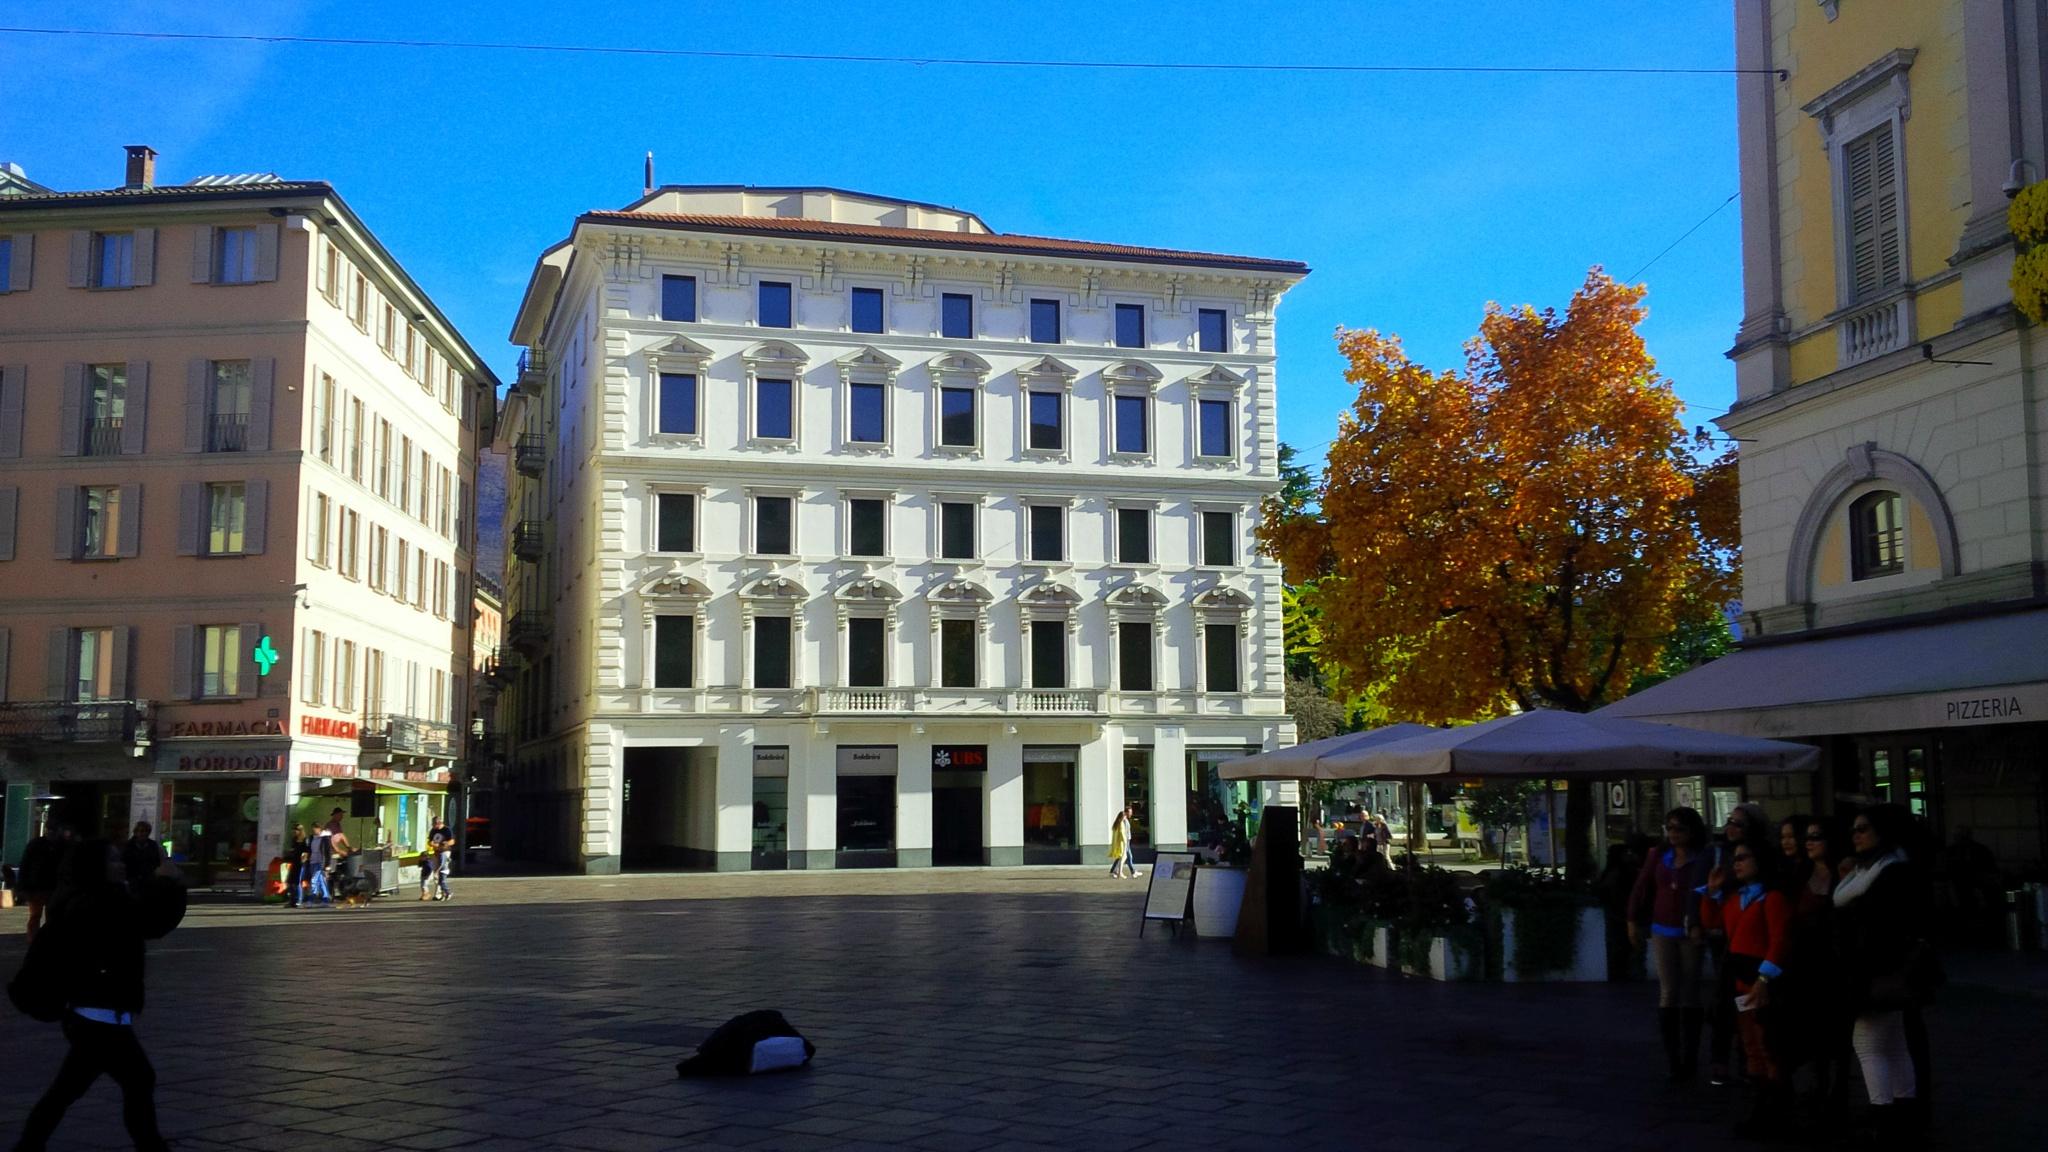 UBS Building by Rudy Tarrazona Guacena